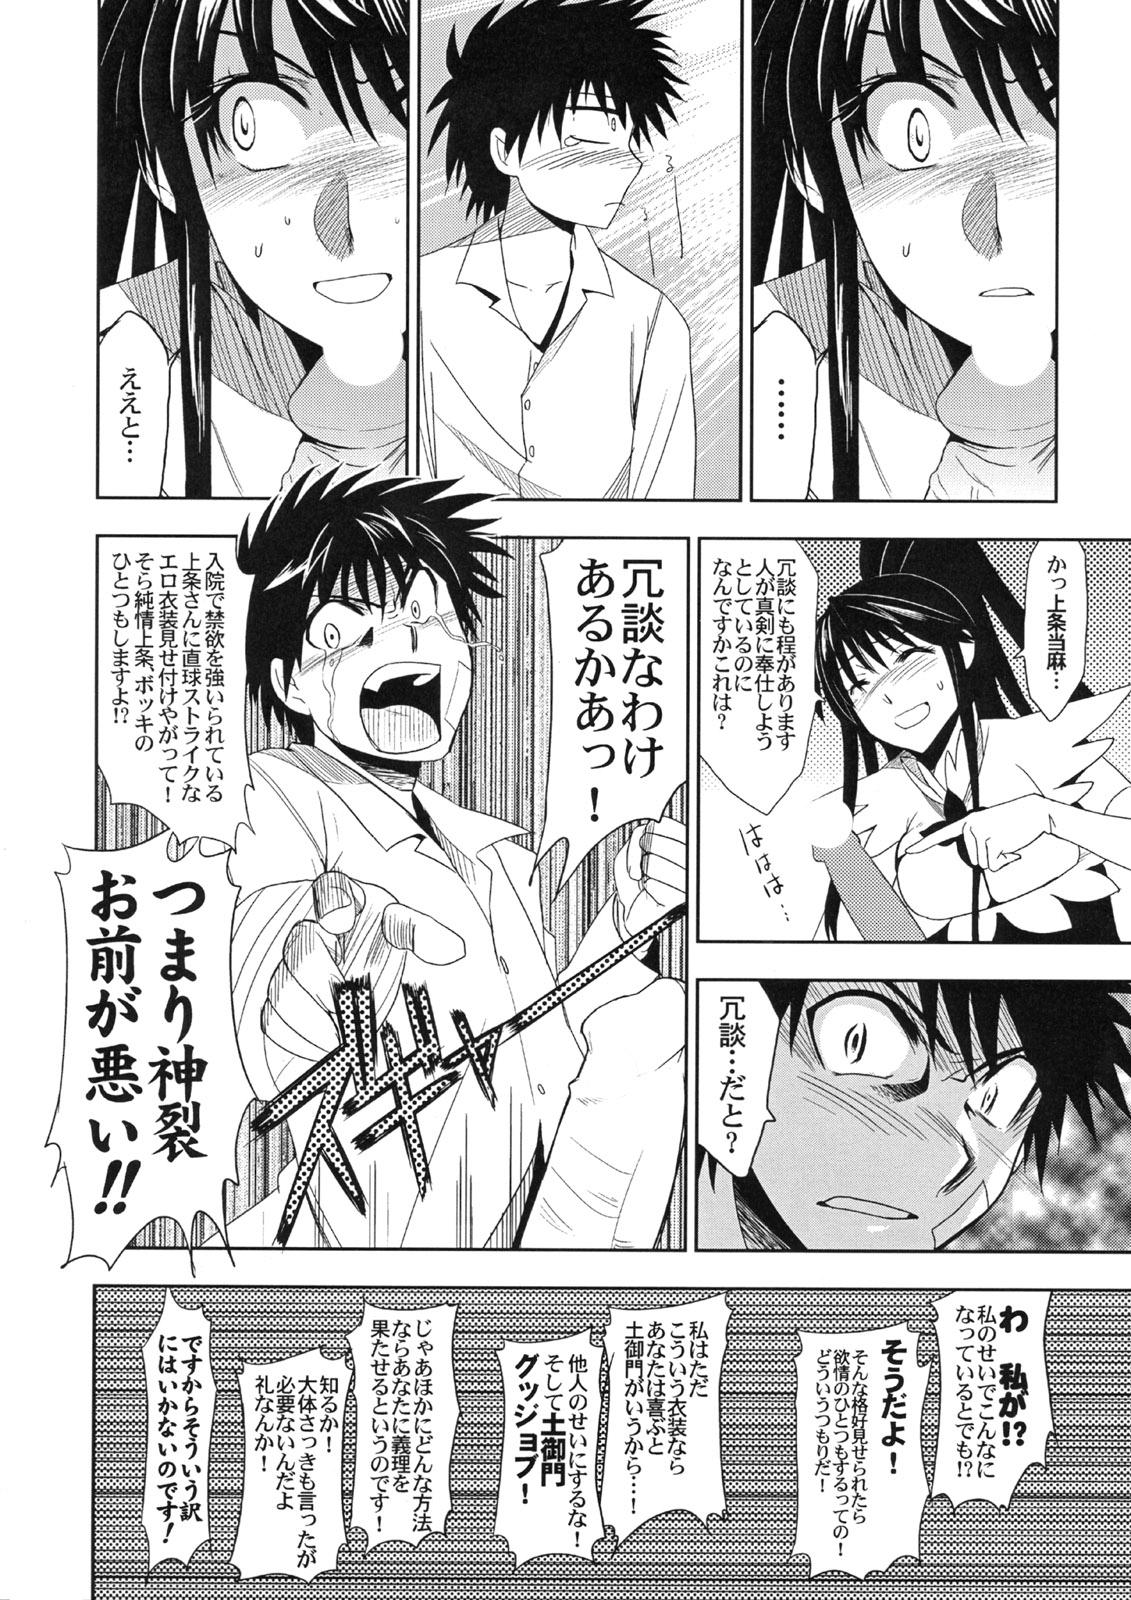 usotsuki to ouji nayameru ohime-sama How to defeat dettlaff in witcher 3